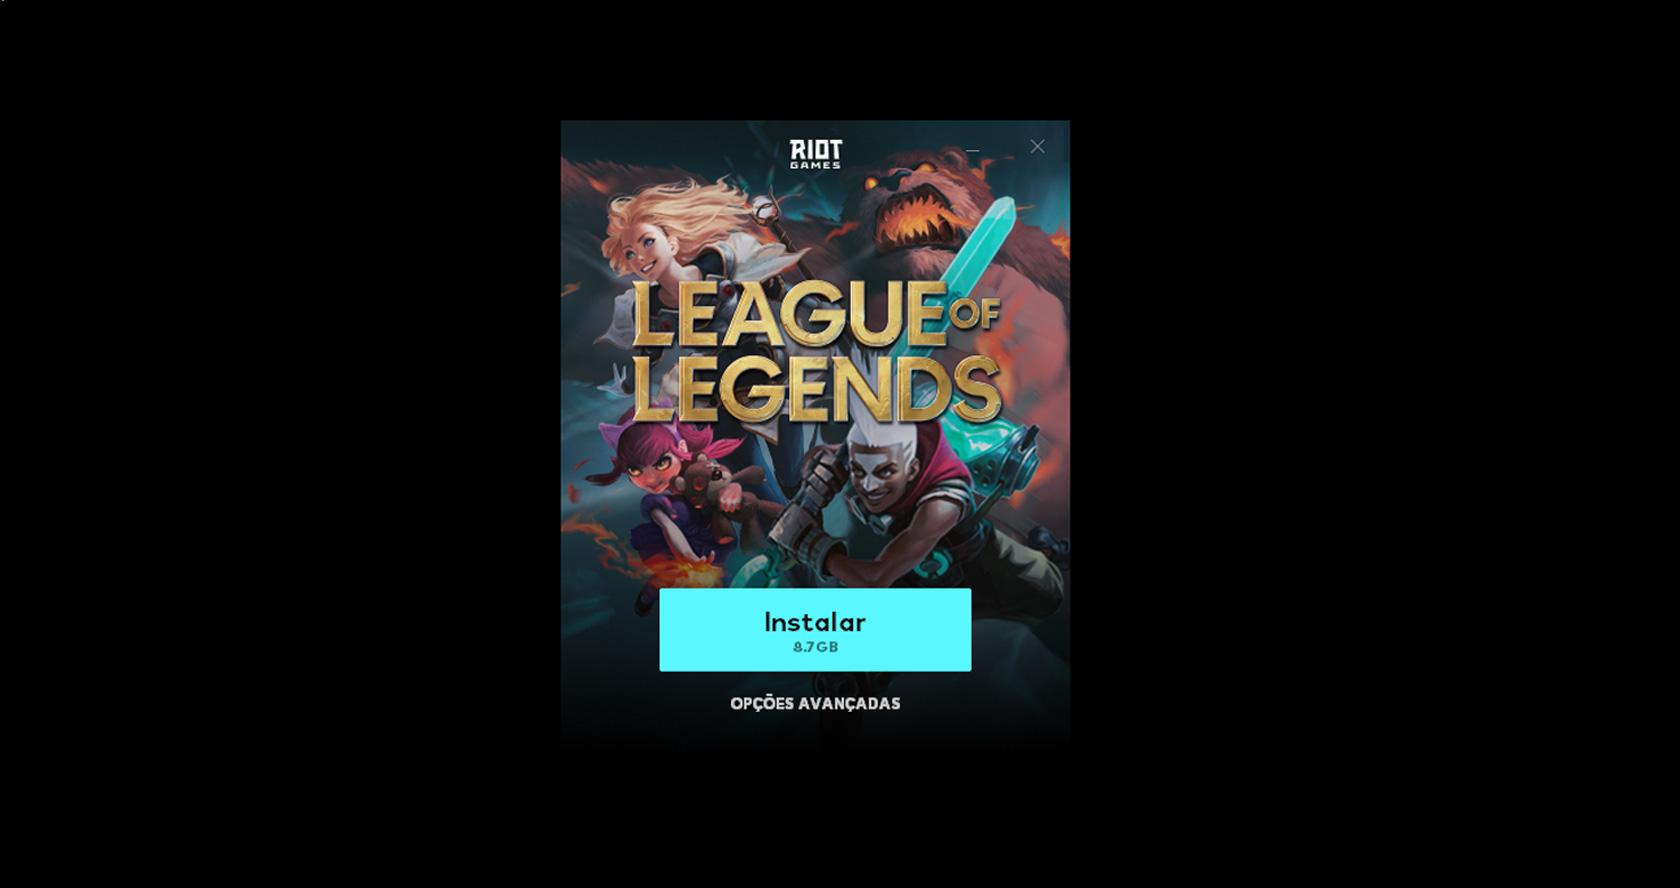 Instalar League of Legends (Imagem: Riot Games/League of Legends)